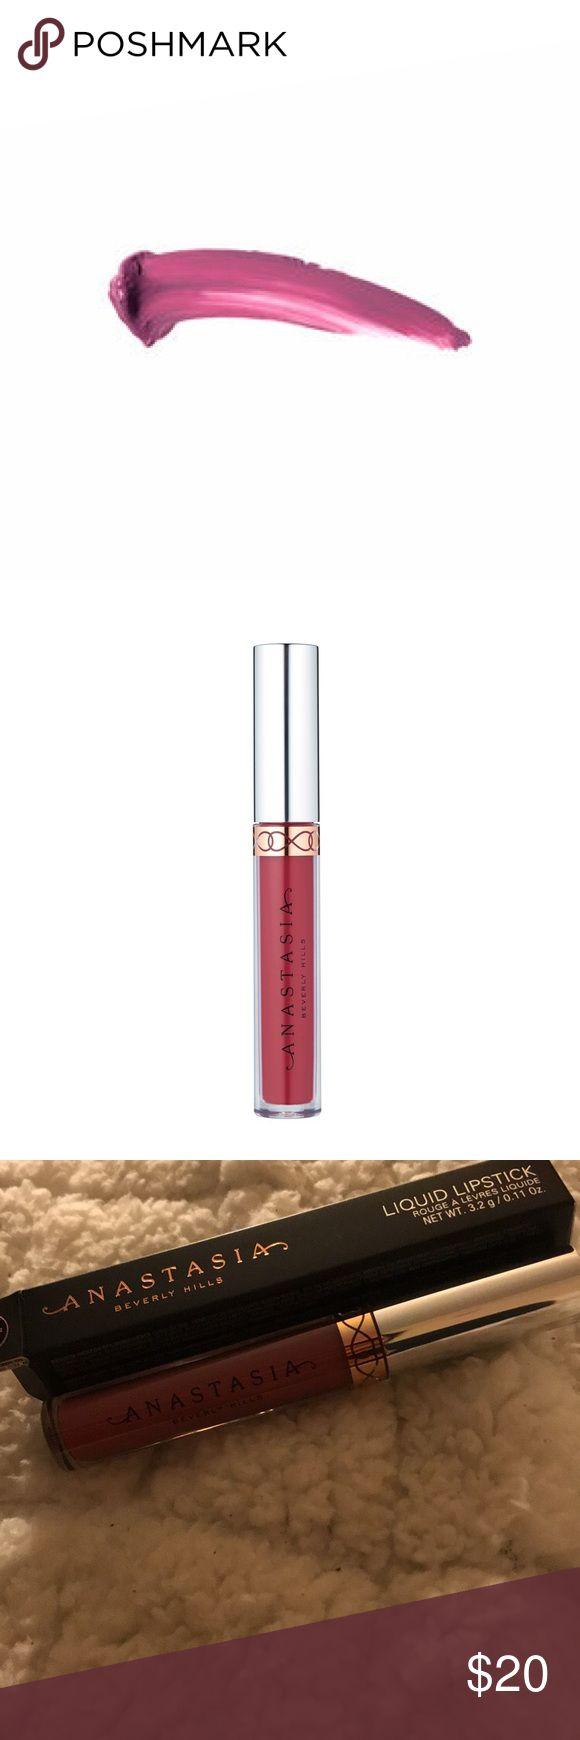 Anastasia BH liquid lipstick -CATNIP  -blush rose pink lipstick super cute !  -bought at Sephora but never used ! Anastasia Beverly Hills Makeup Lipstick